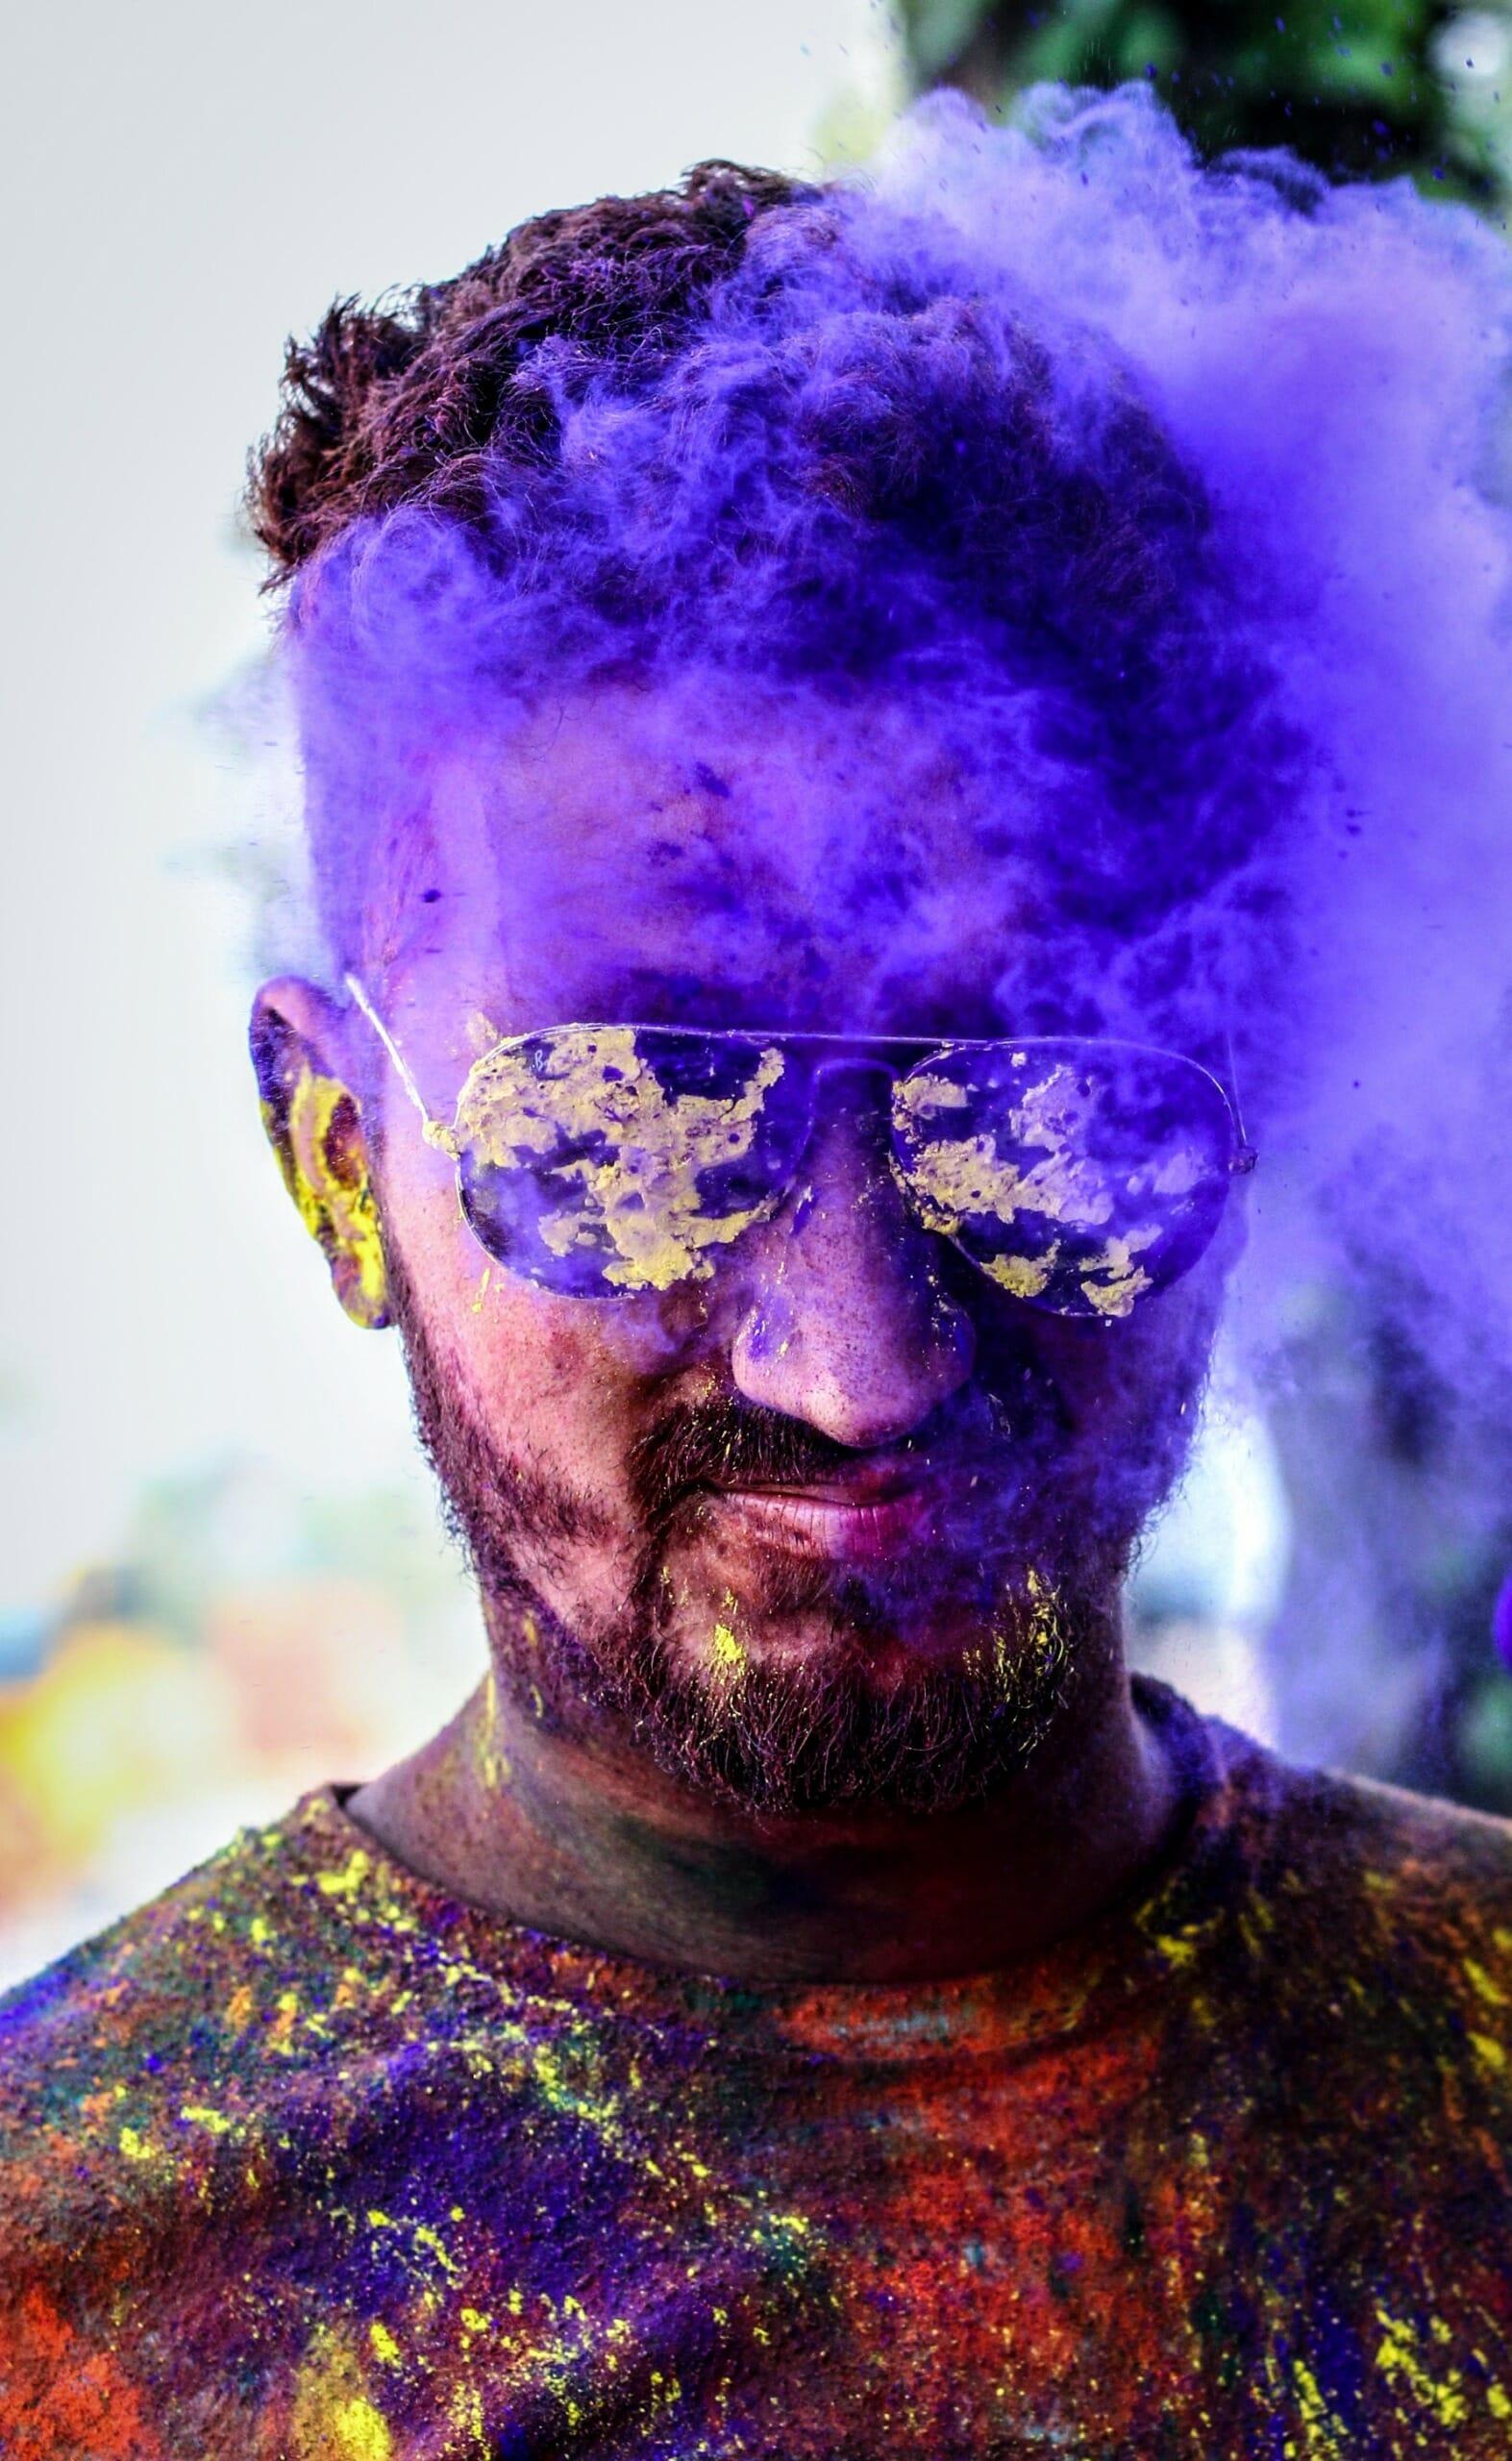 Stylish man in black aviator sunglasses with purple smoke